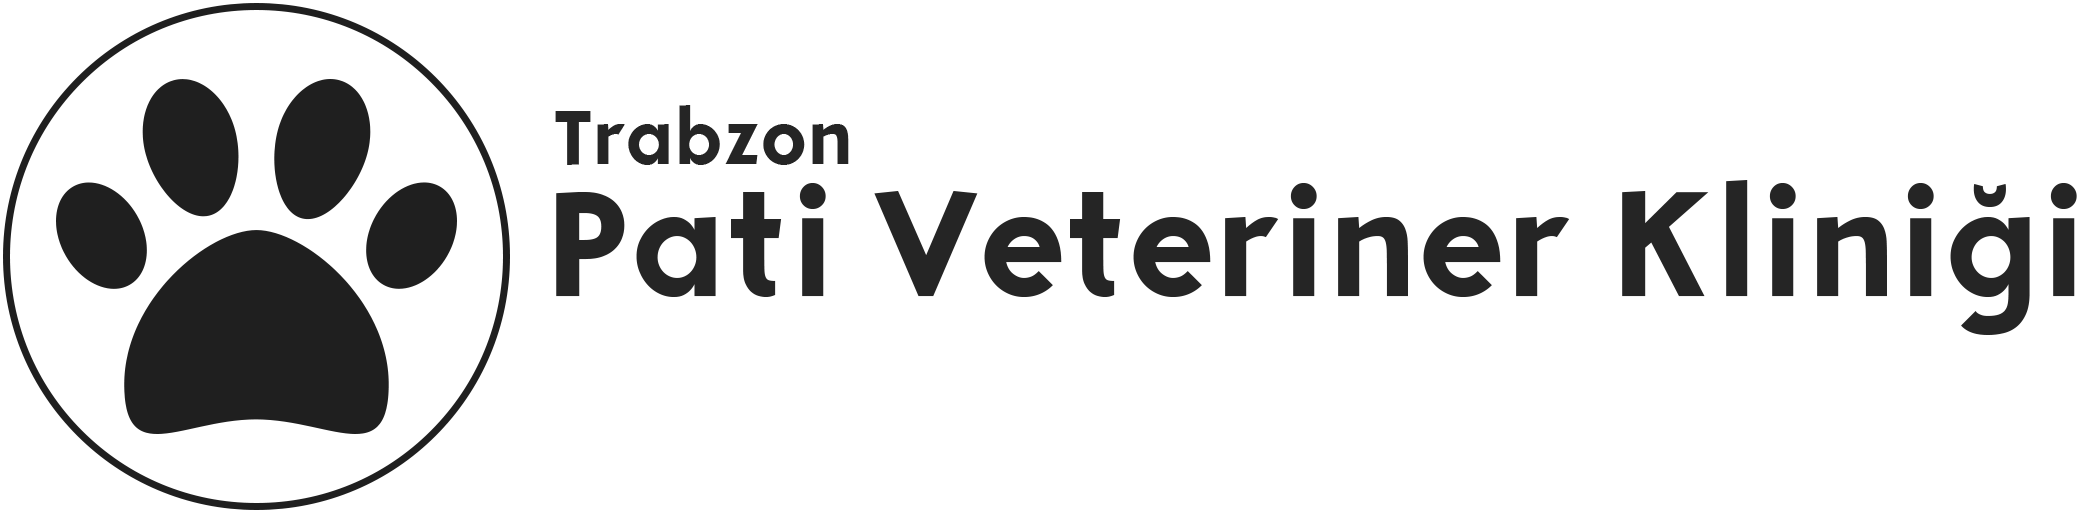 Pati Veteriner Kliniği